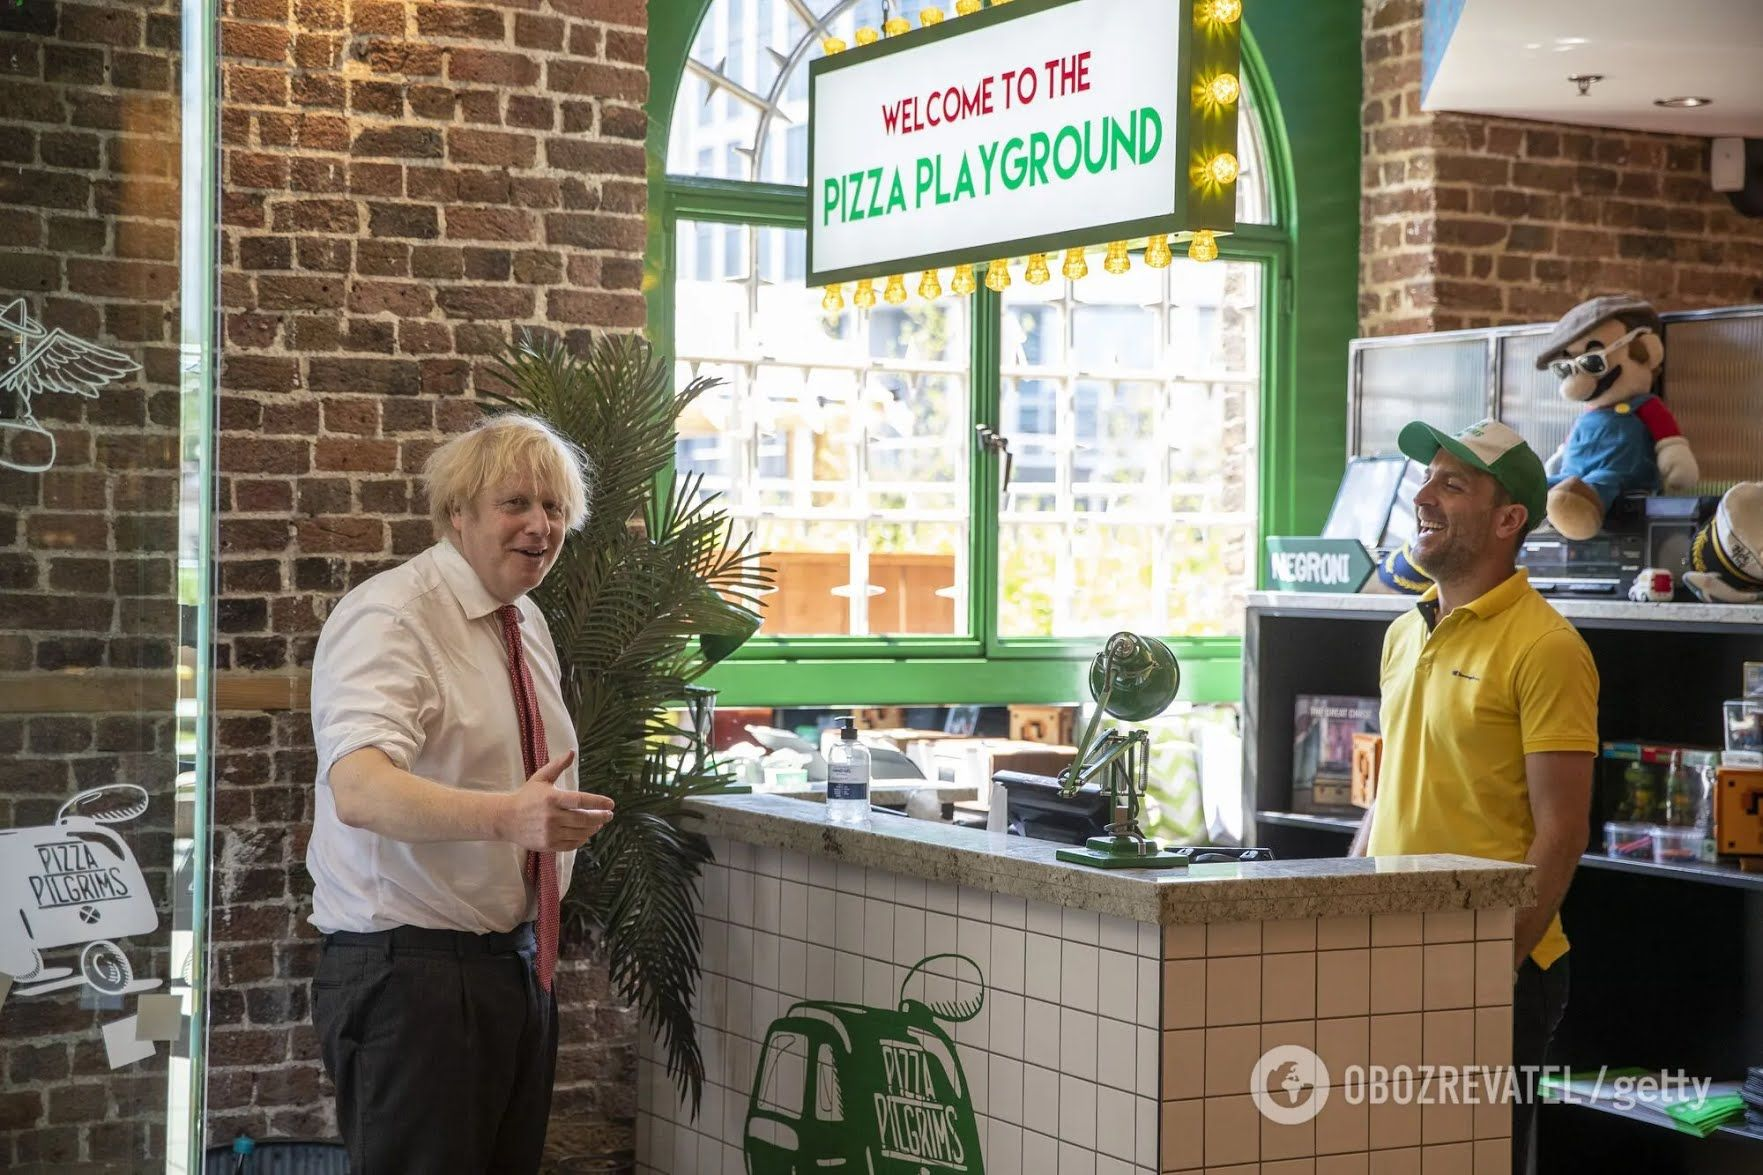 В Британии молодежи будут давать скидки на пиццу за прививку против COVID-19